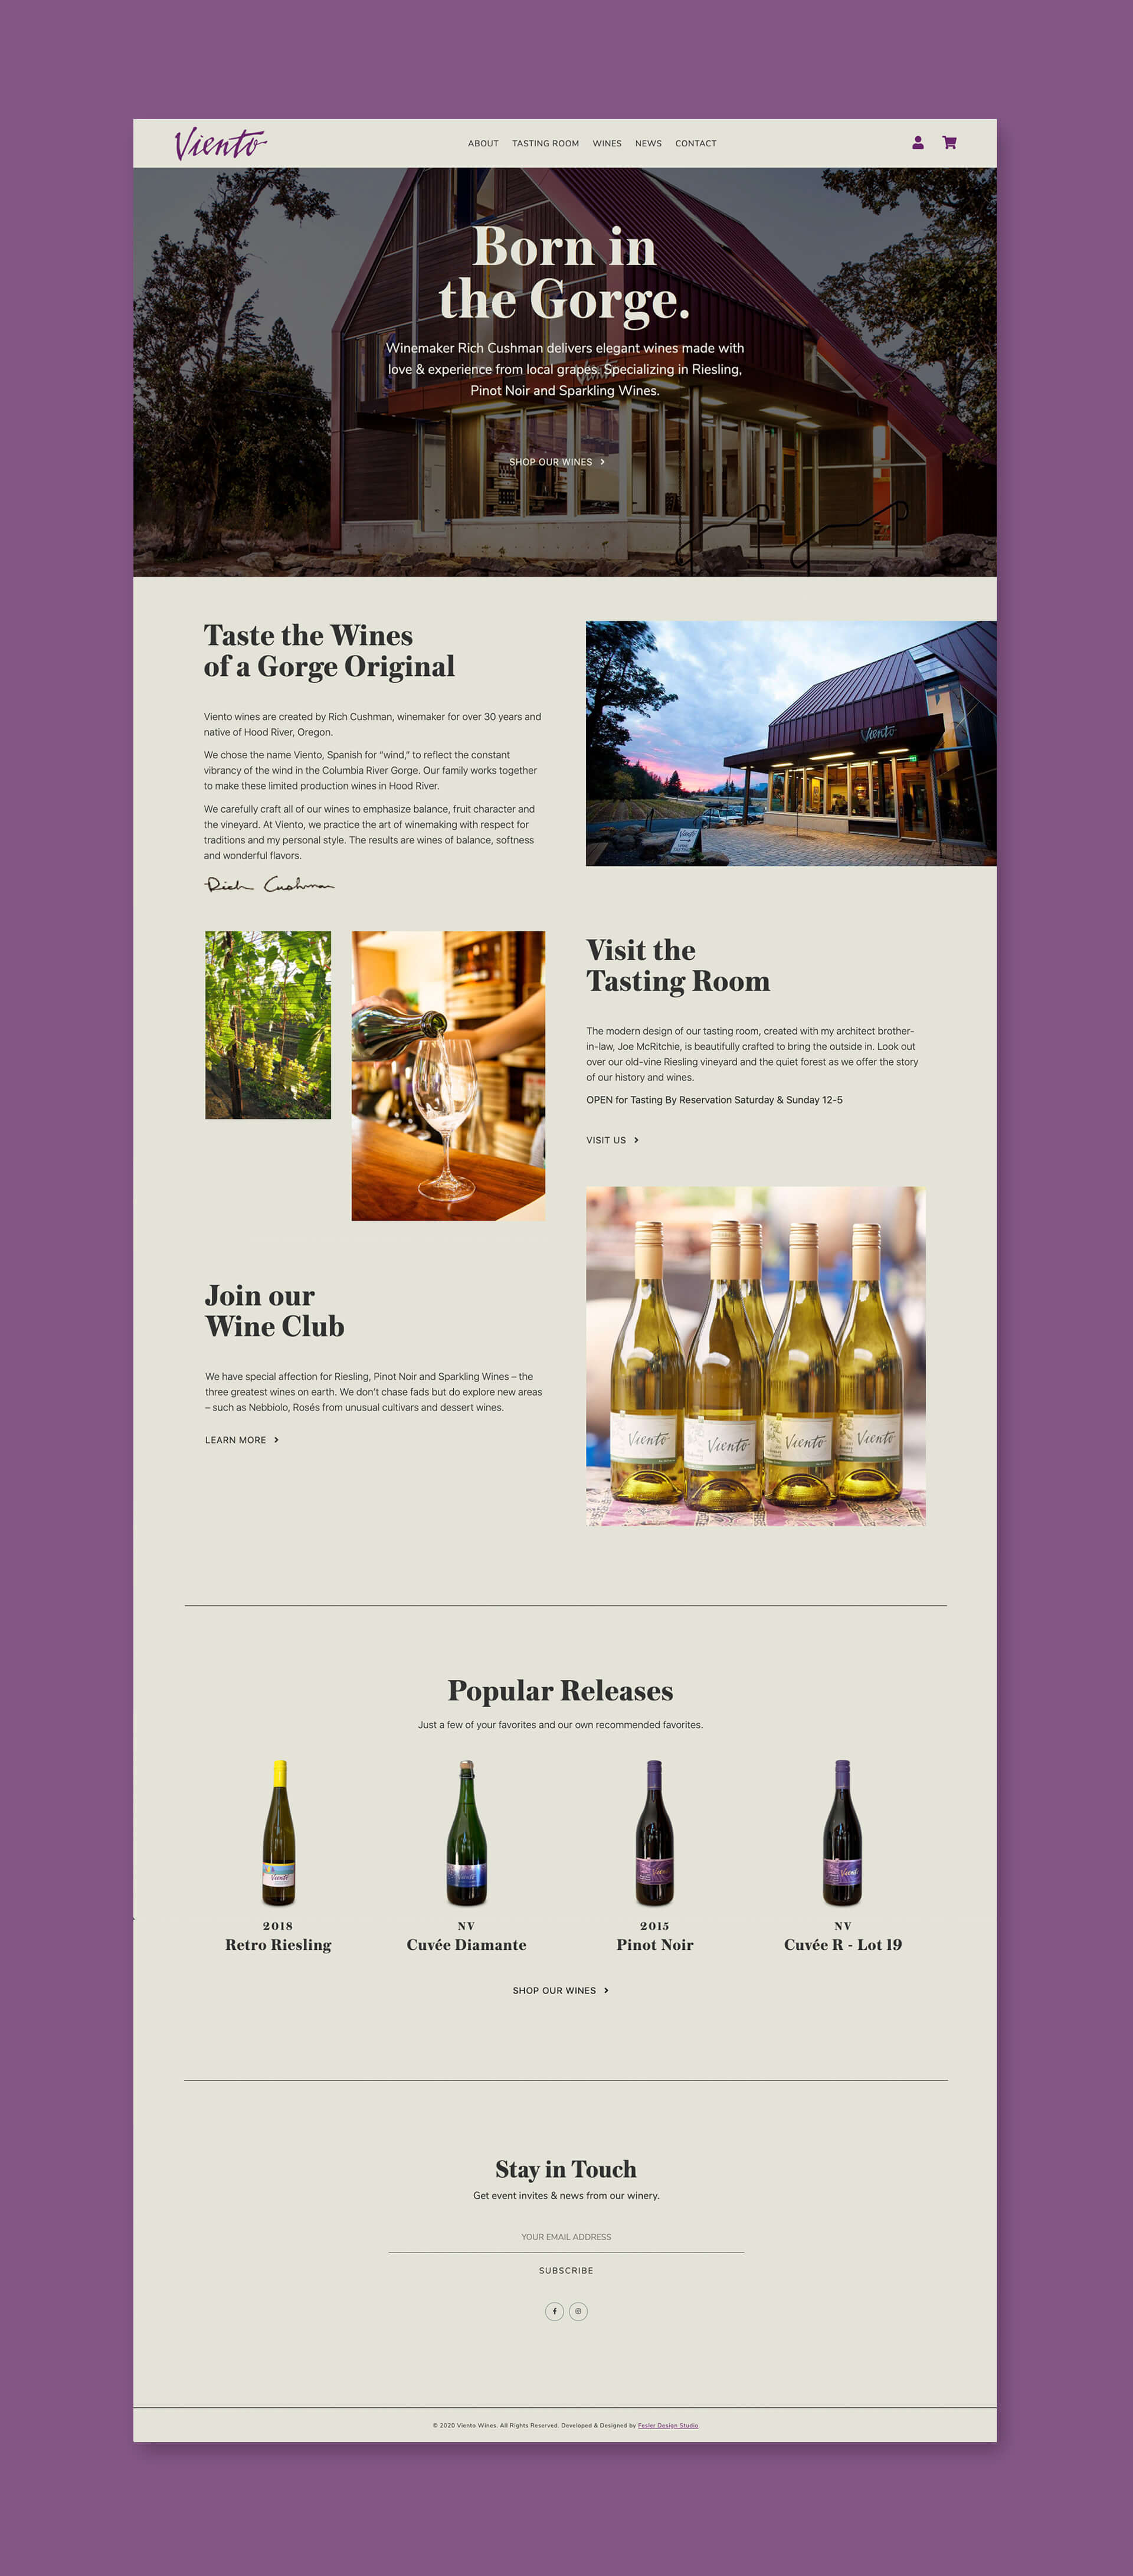 Viento Wines website design homepage mockup